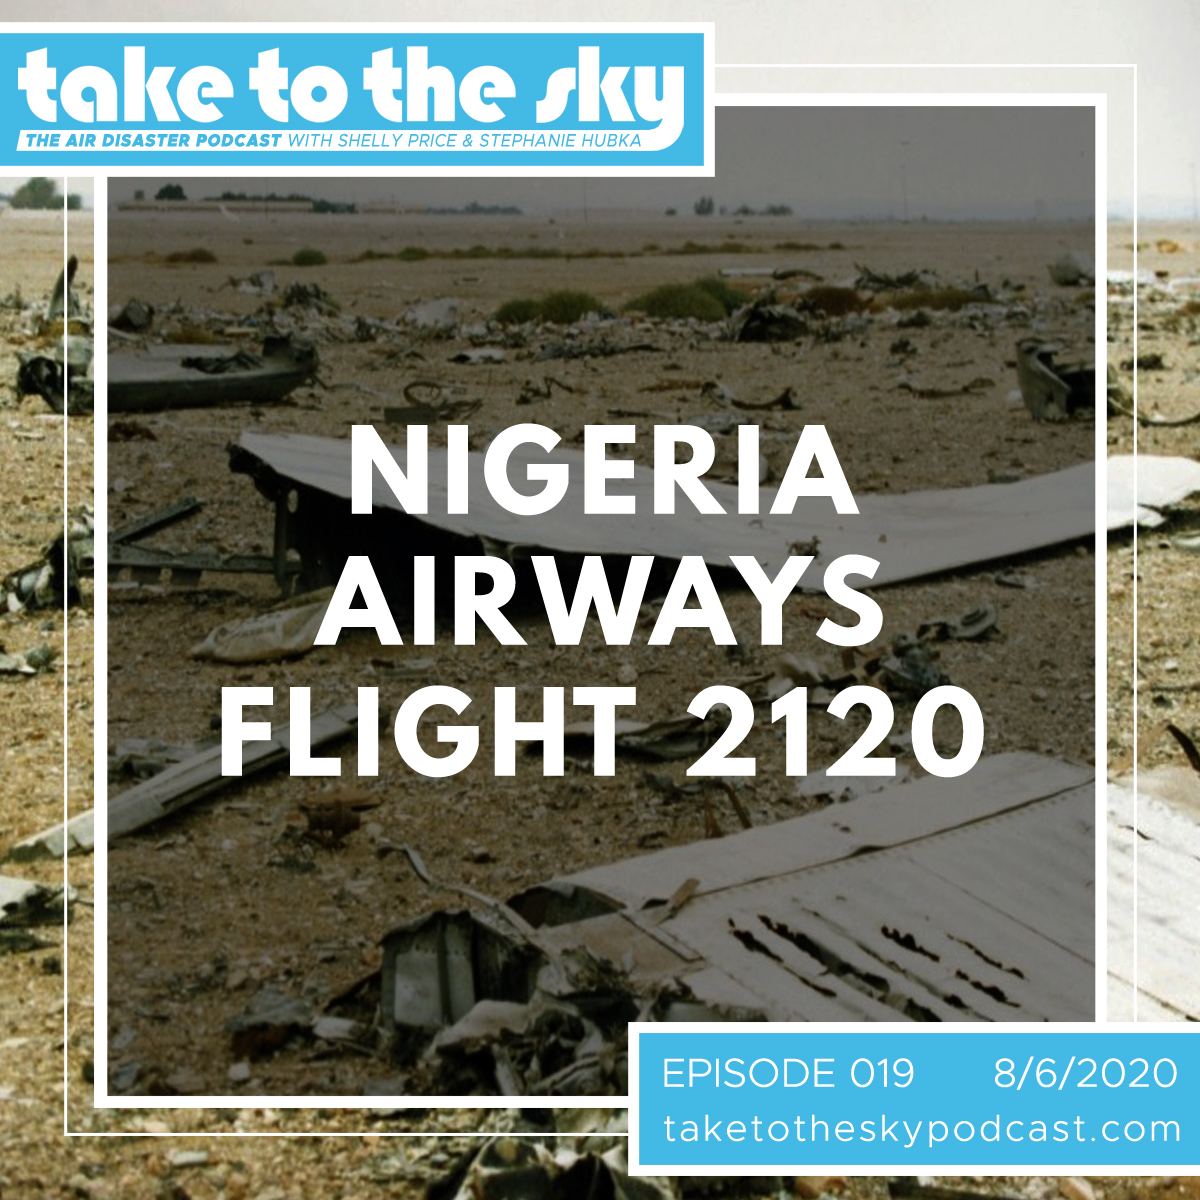 Take to the Sky Episode 019: Nigeria Airways Flight 2120